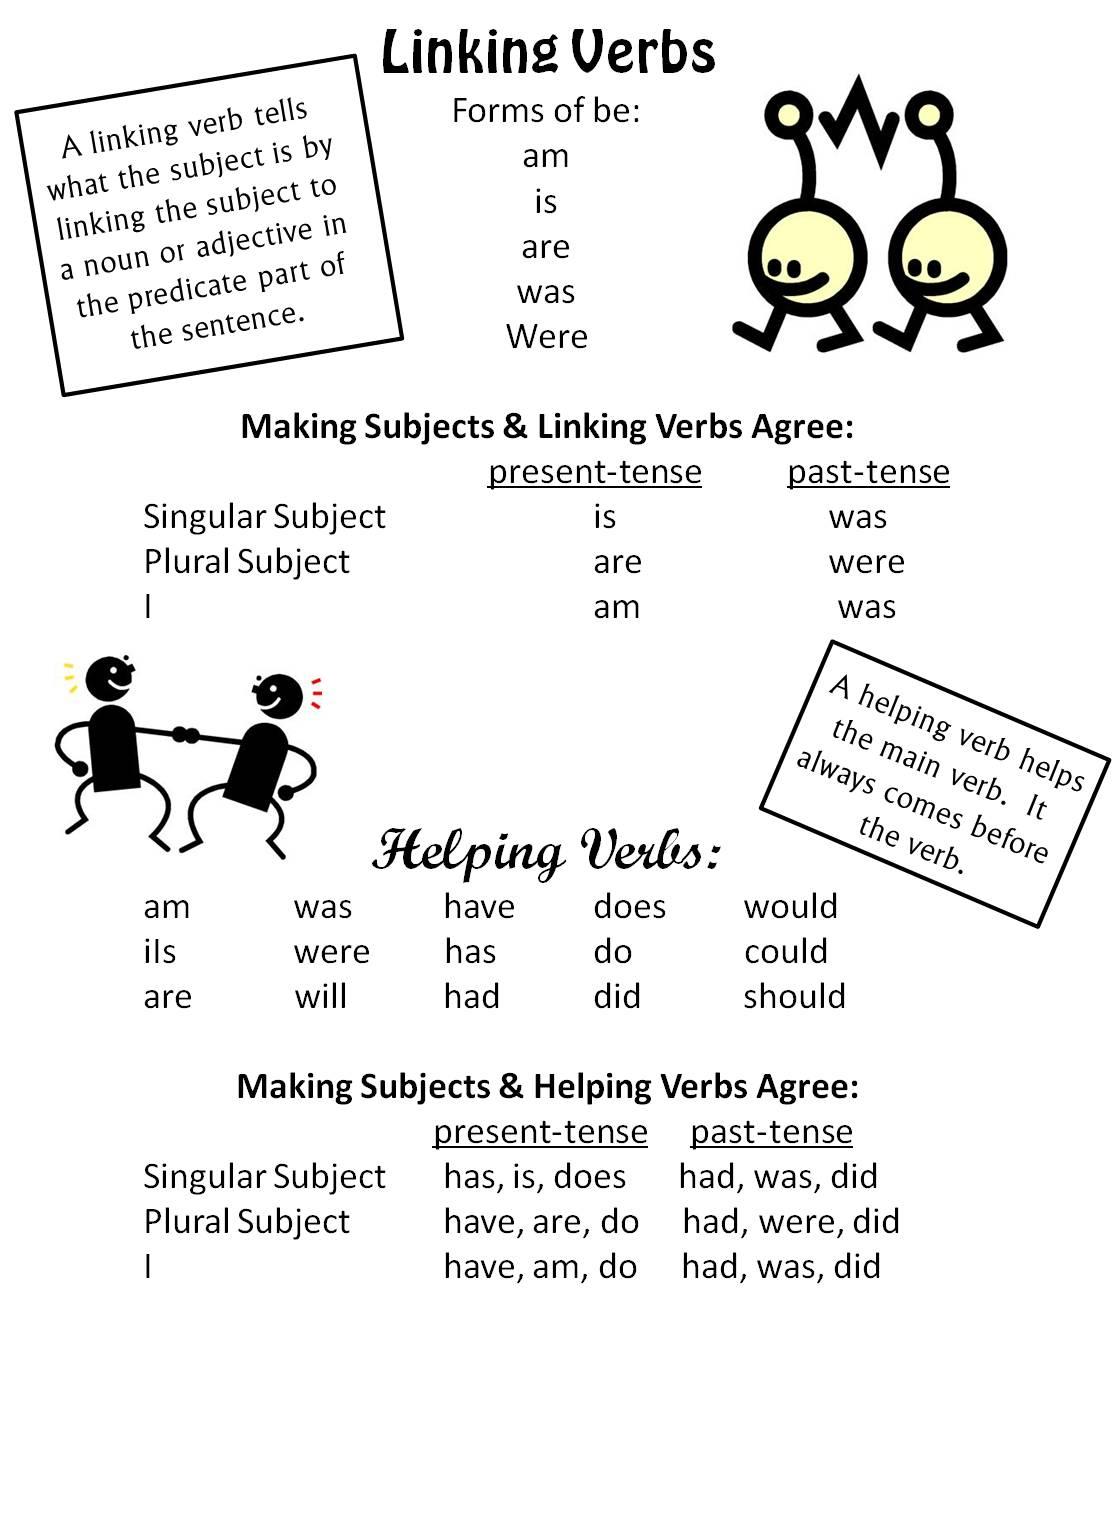 Linking Verbs Worksheets 5th Grade